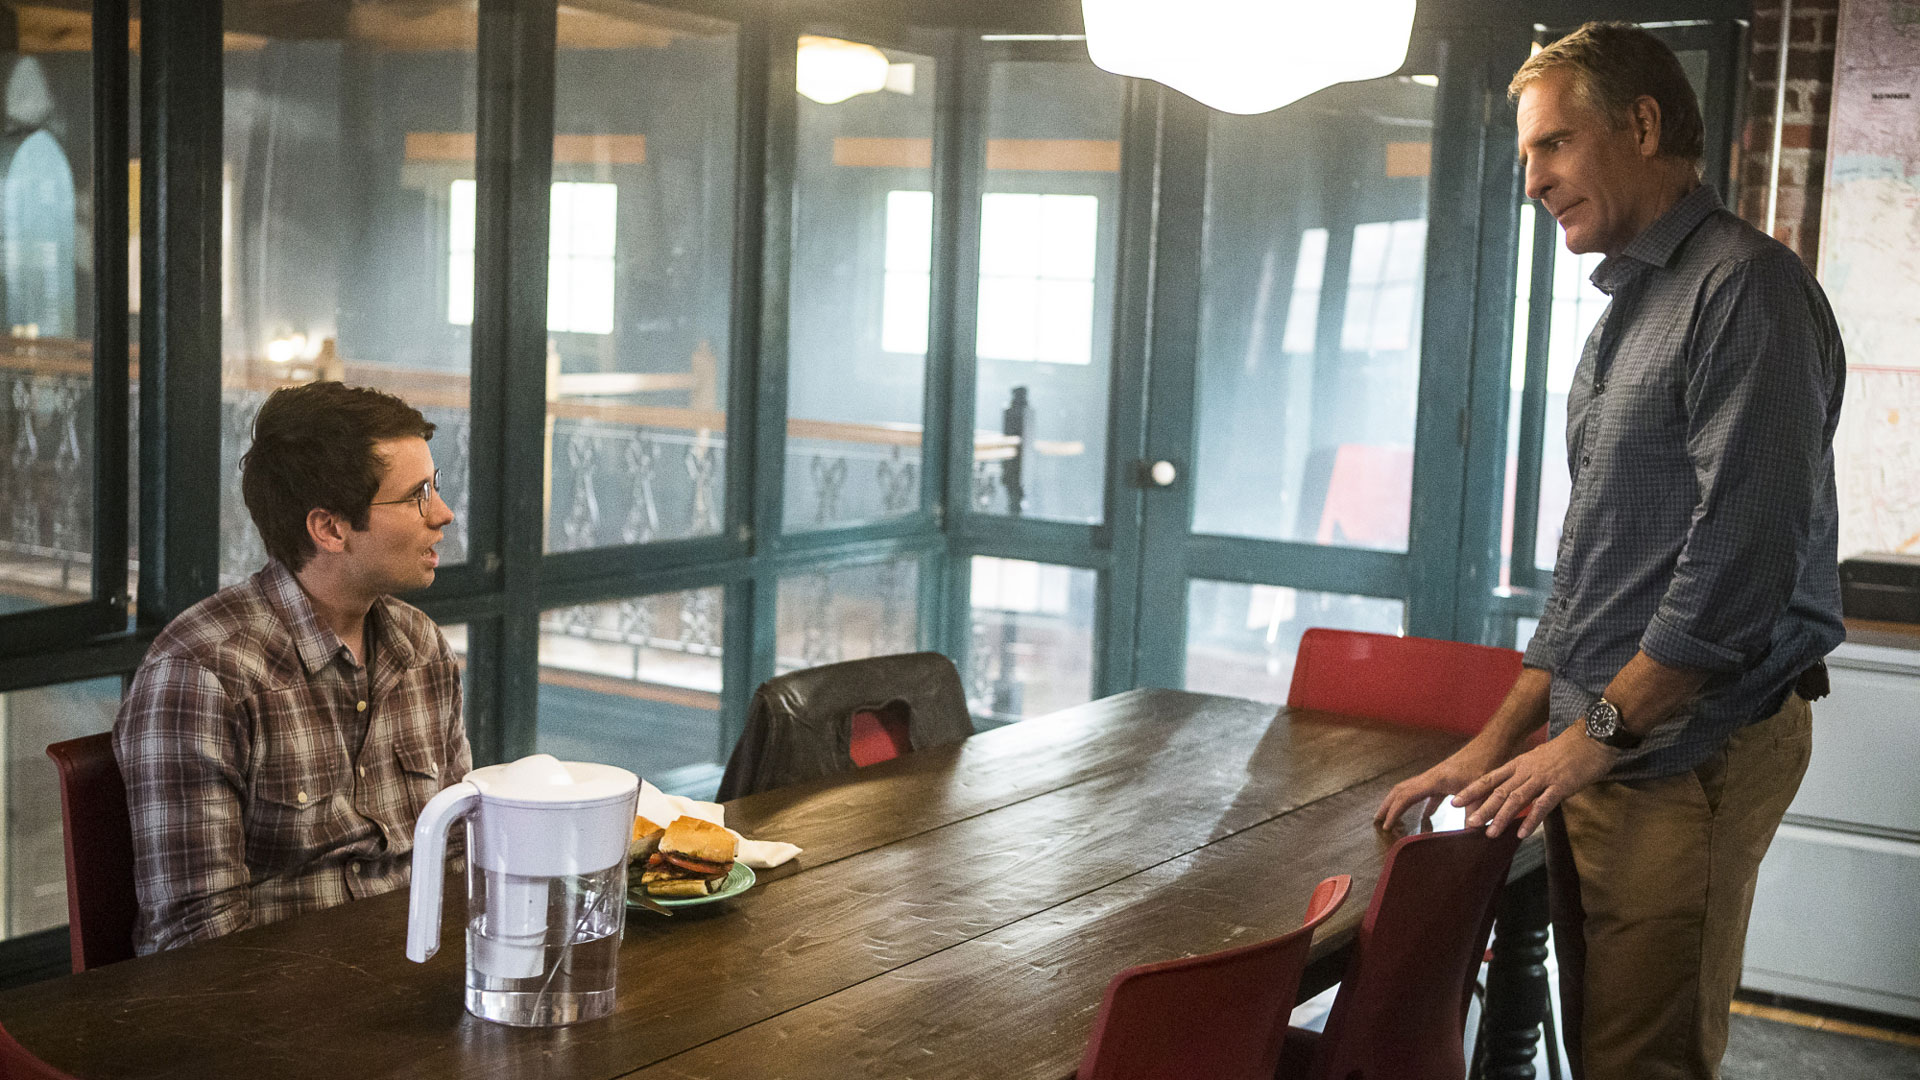 Scott Bakula as Agent Dwayne Pride